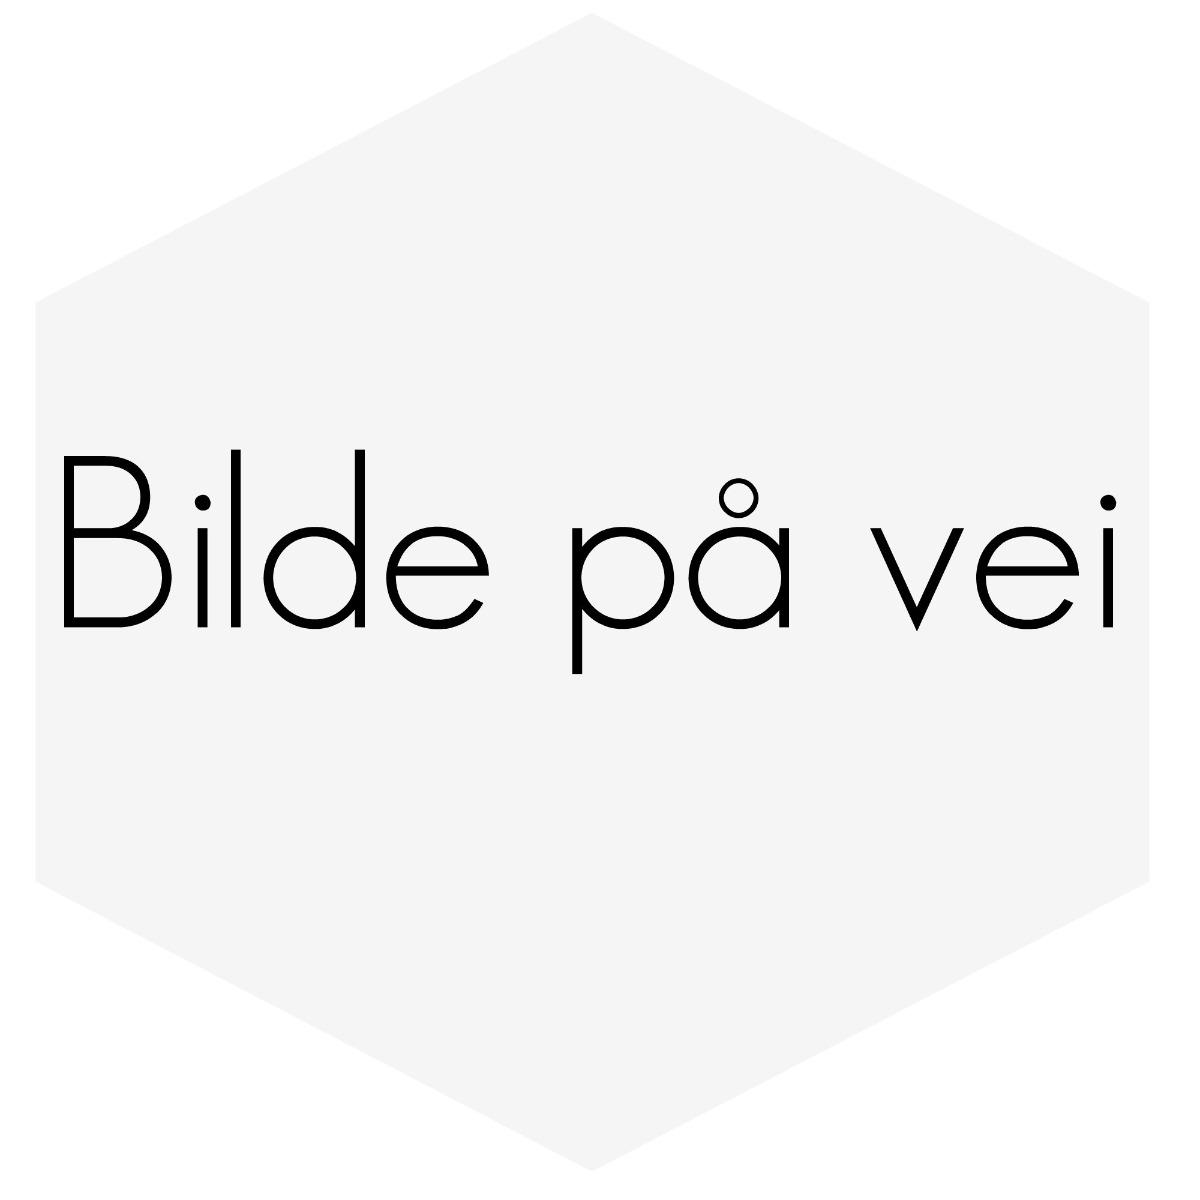 SILIKONSLANGE ARMERT BLÅ  0,1875'' (5MM),pris pr meter